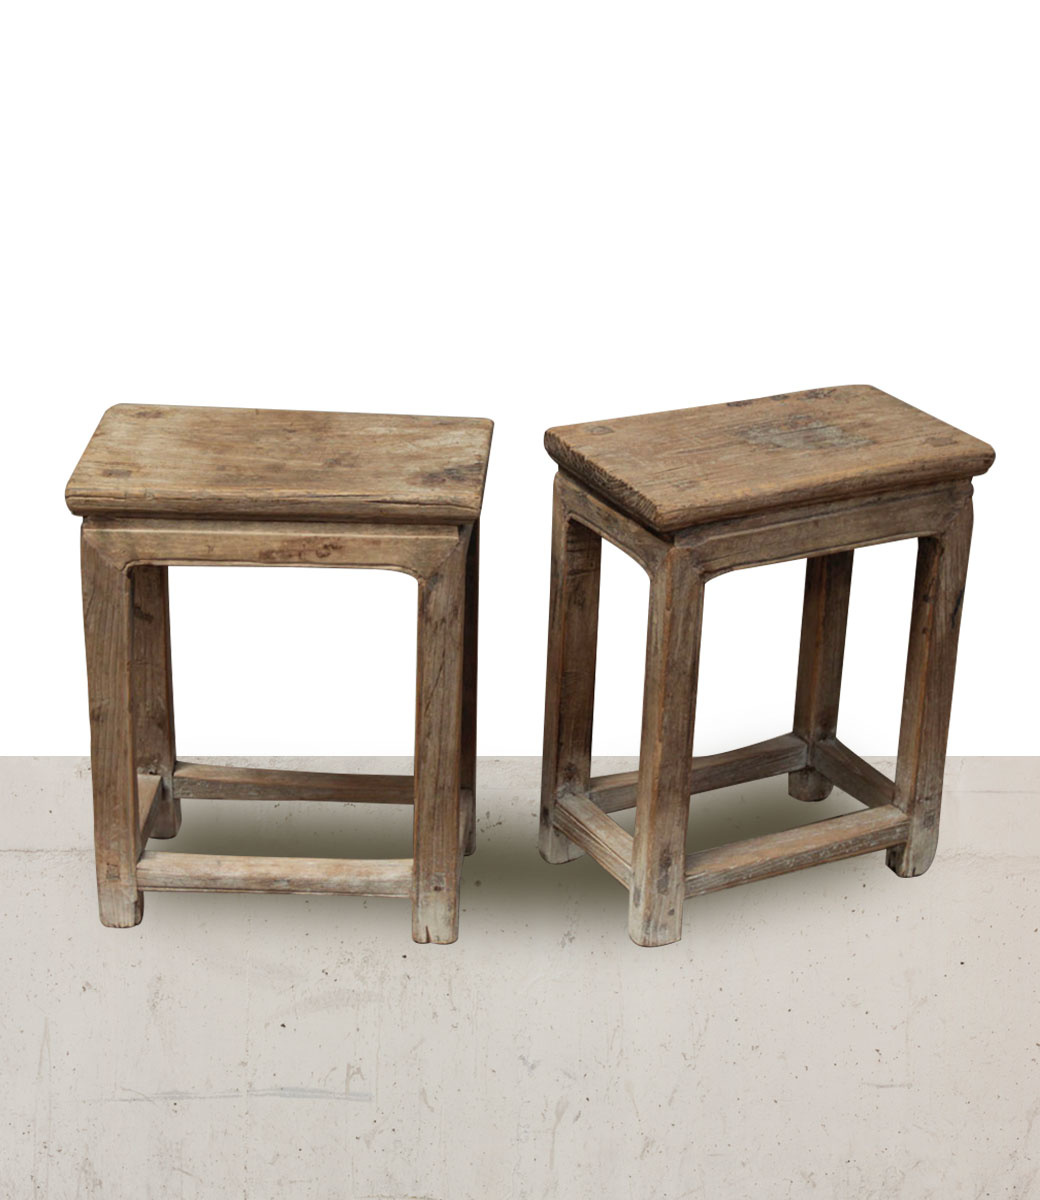 Petite Lily Interiors Raw wood side table - elm wood - 41x24xh50cm - unique item